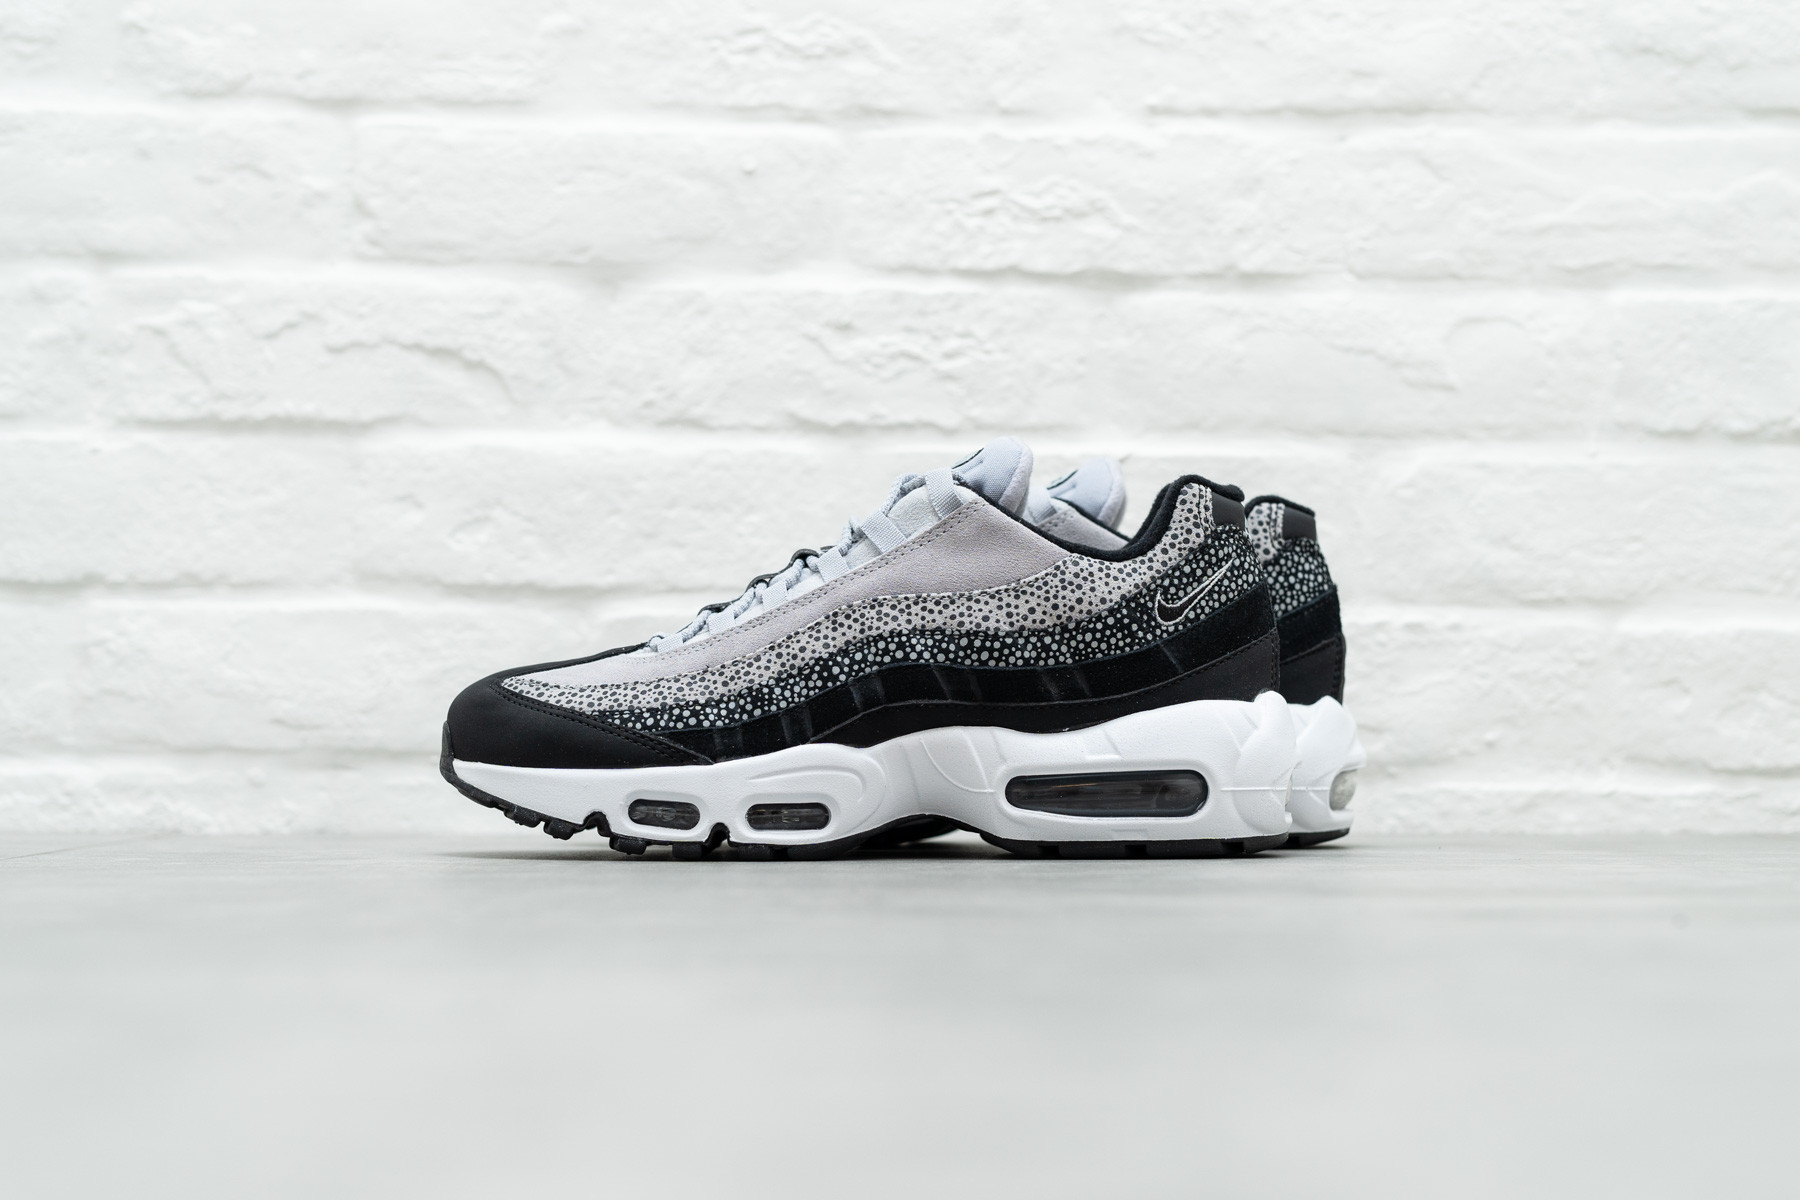 NIKE SPORTSWEAR Air Max 95 Prm Sneakers for Women White